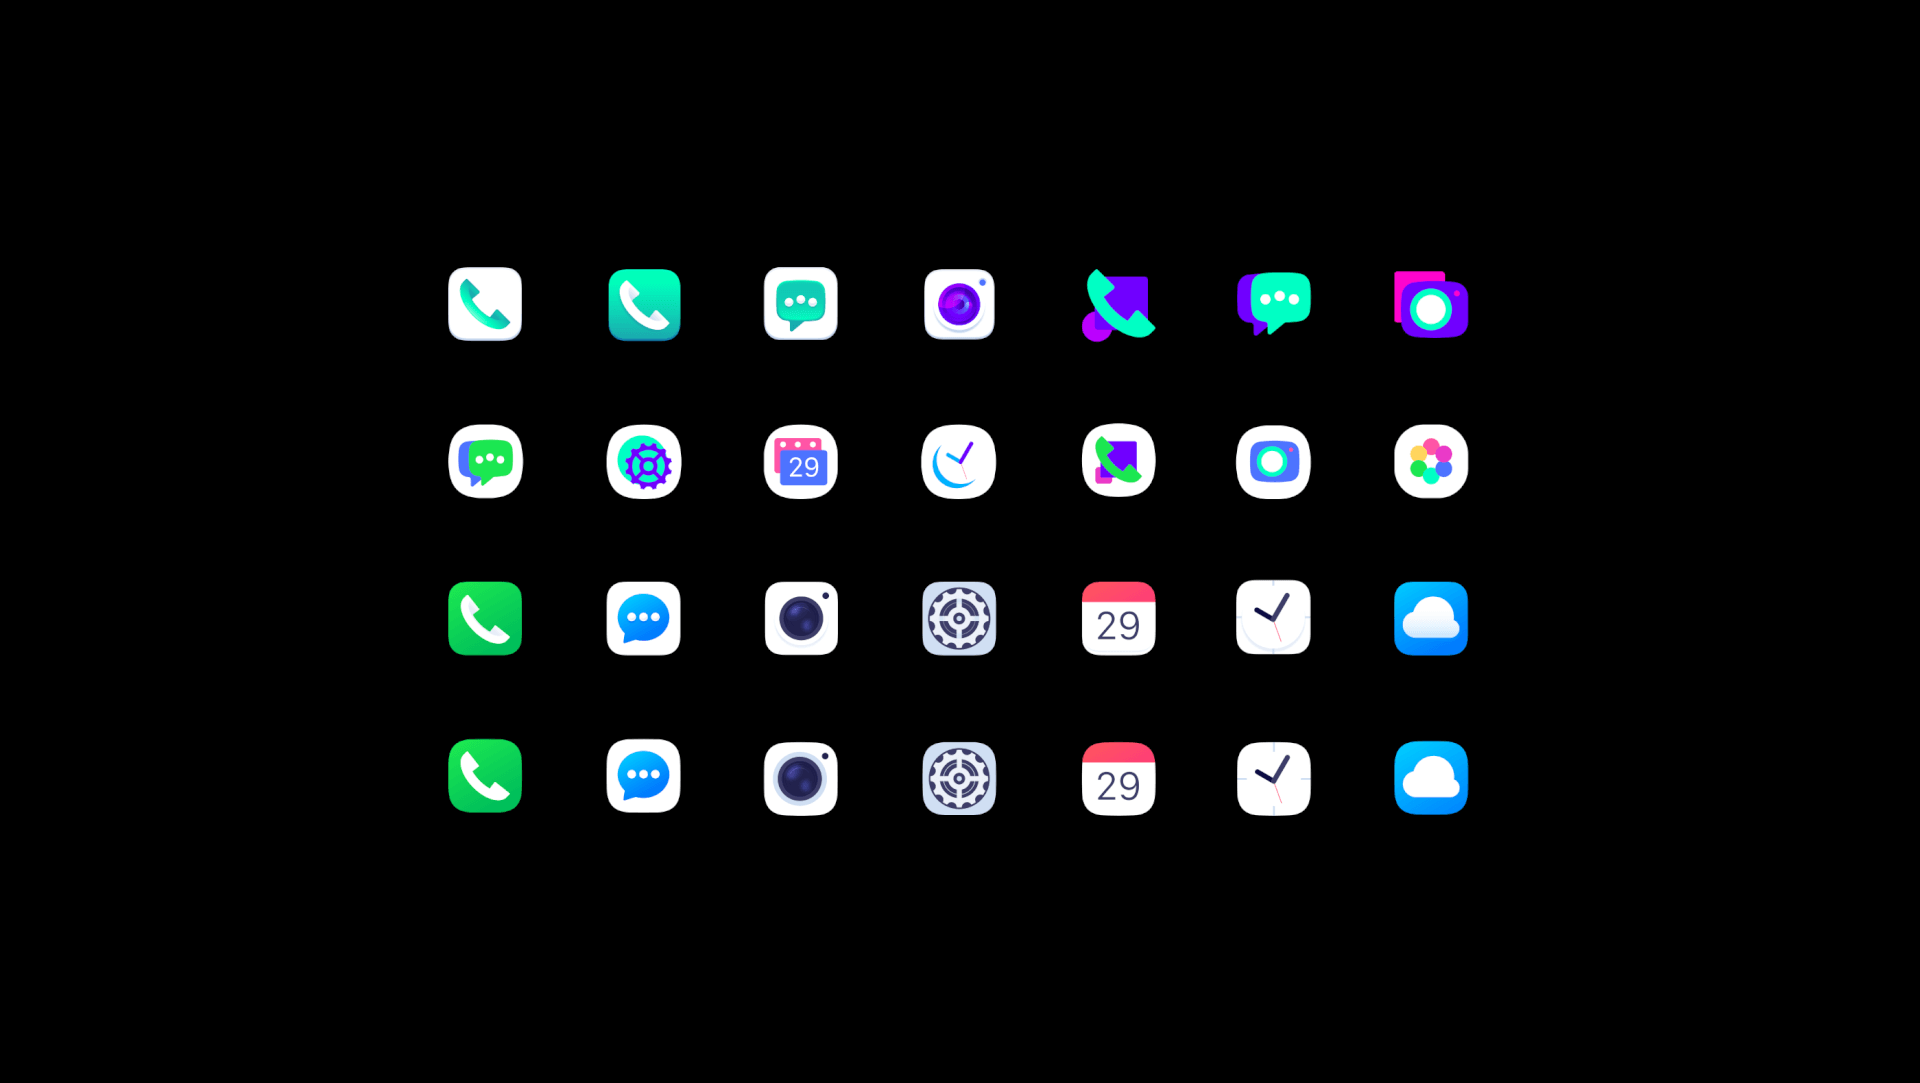 HUAWEI_EMUI_icons_tubik design process